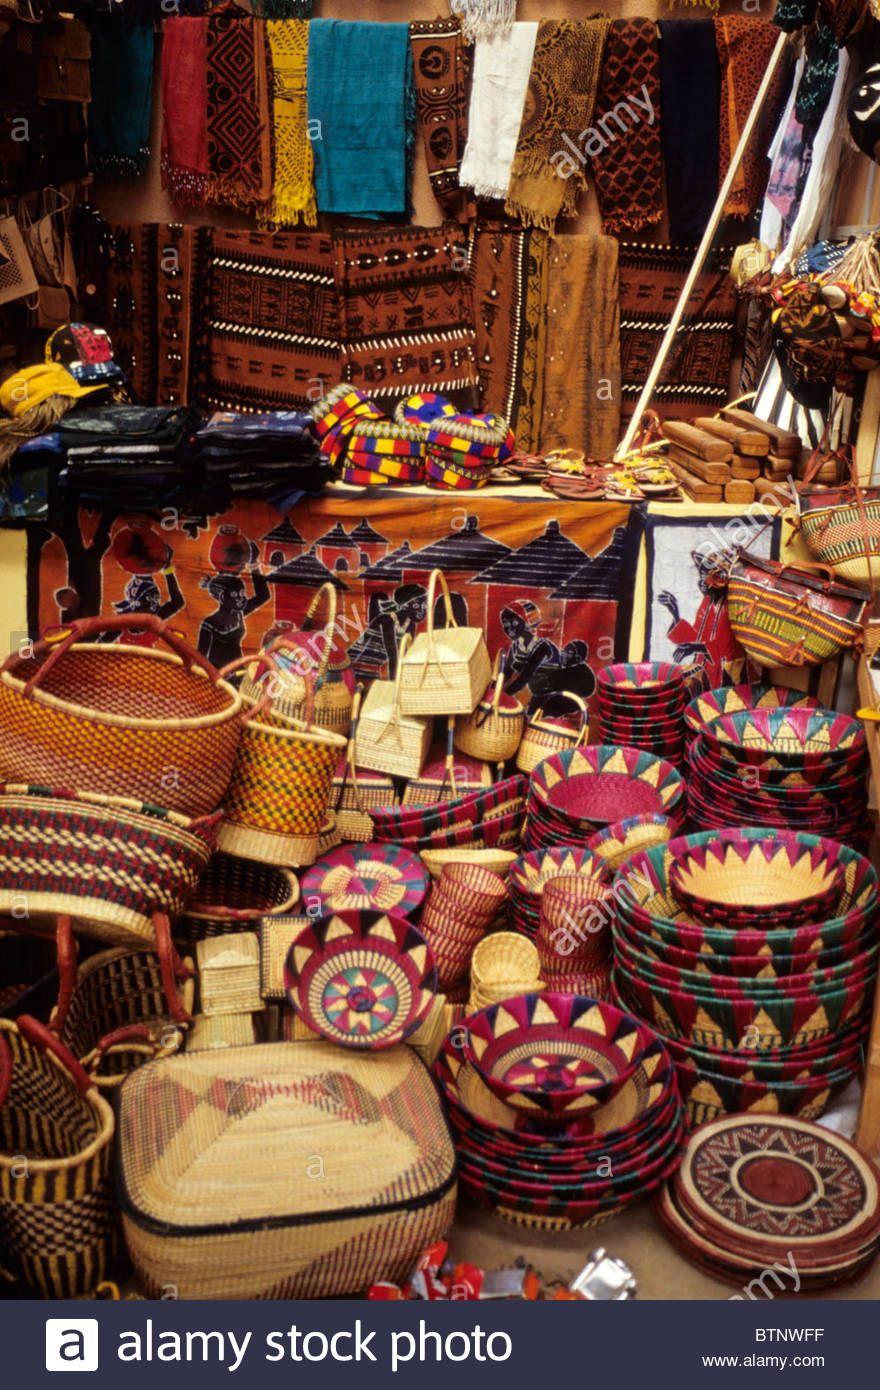 Ouagadougou Burkina Faso Vendor S Stand Selling Baskets Fabric